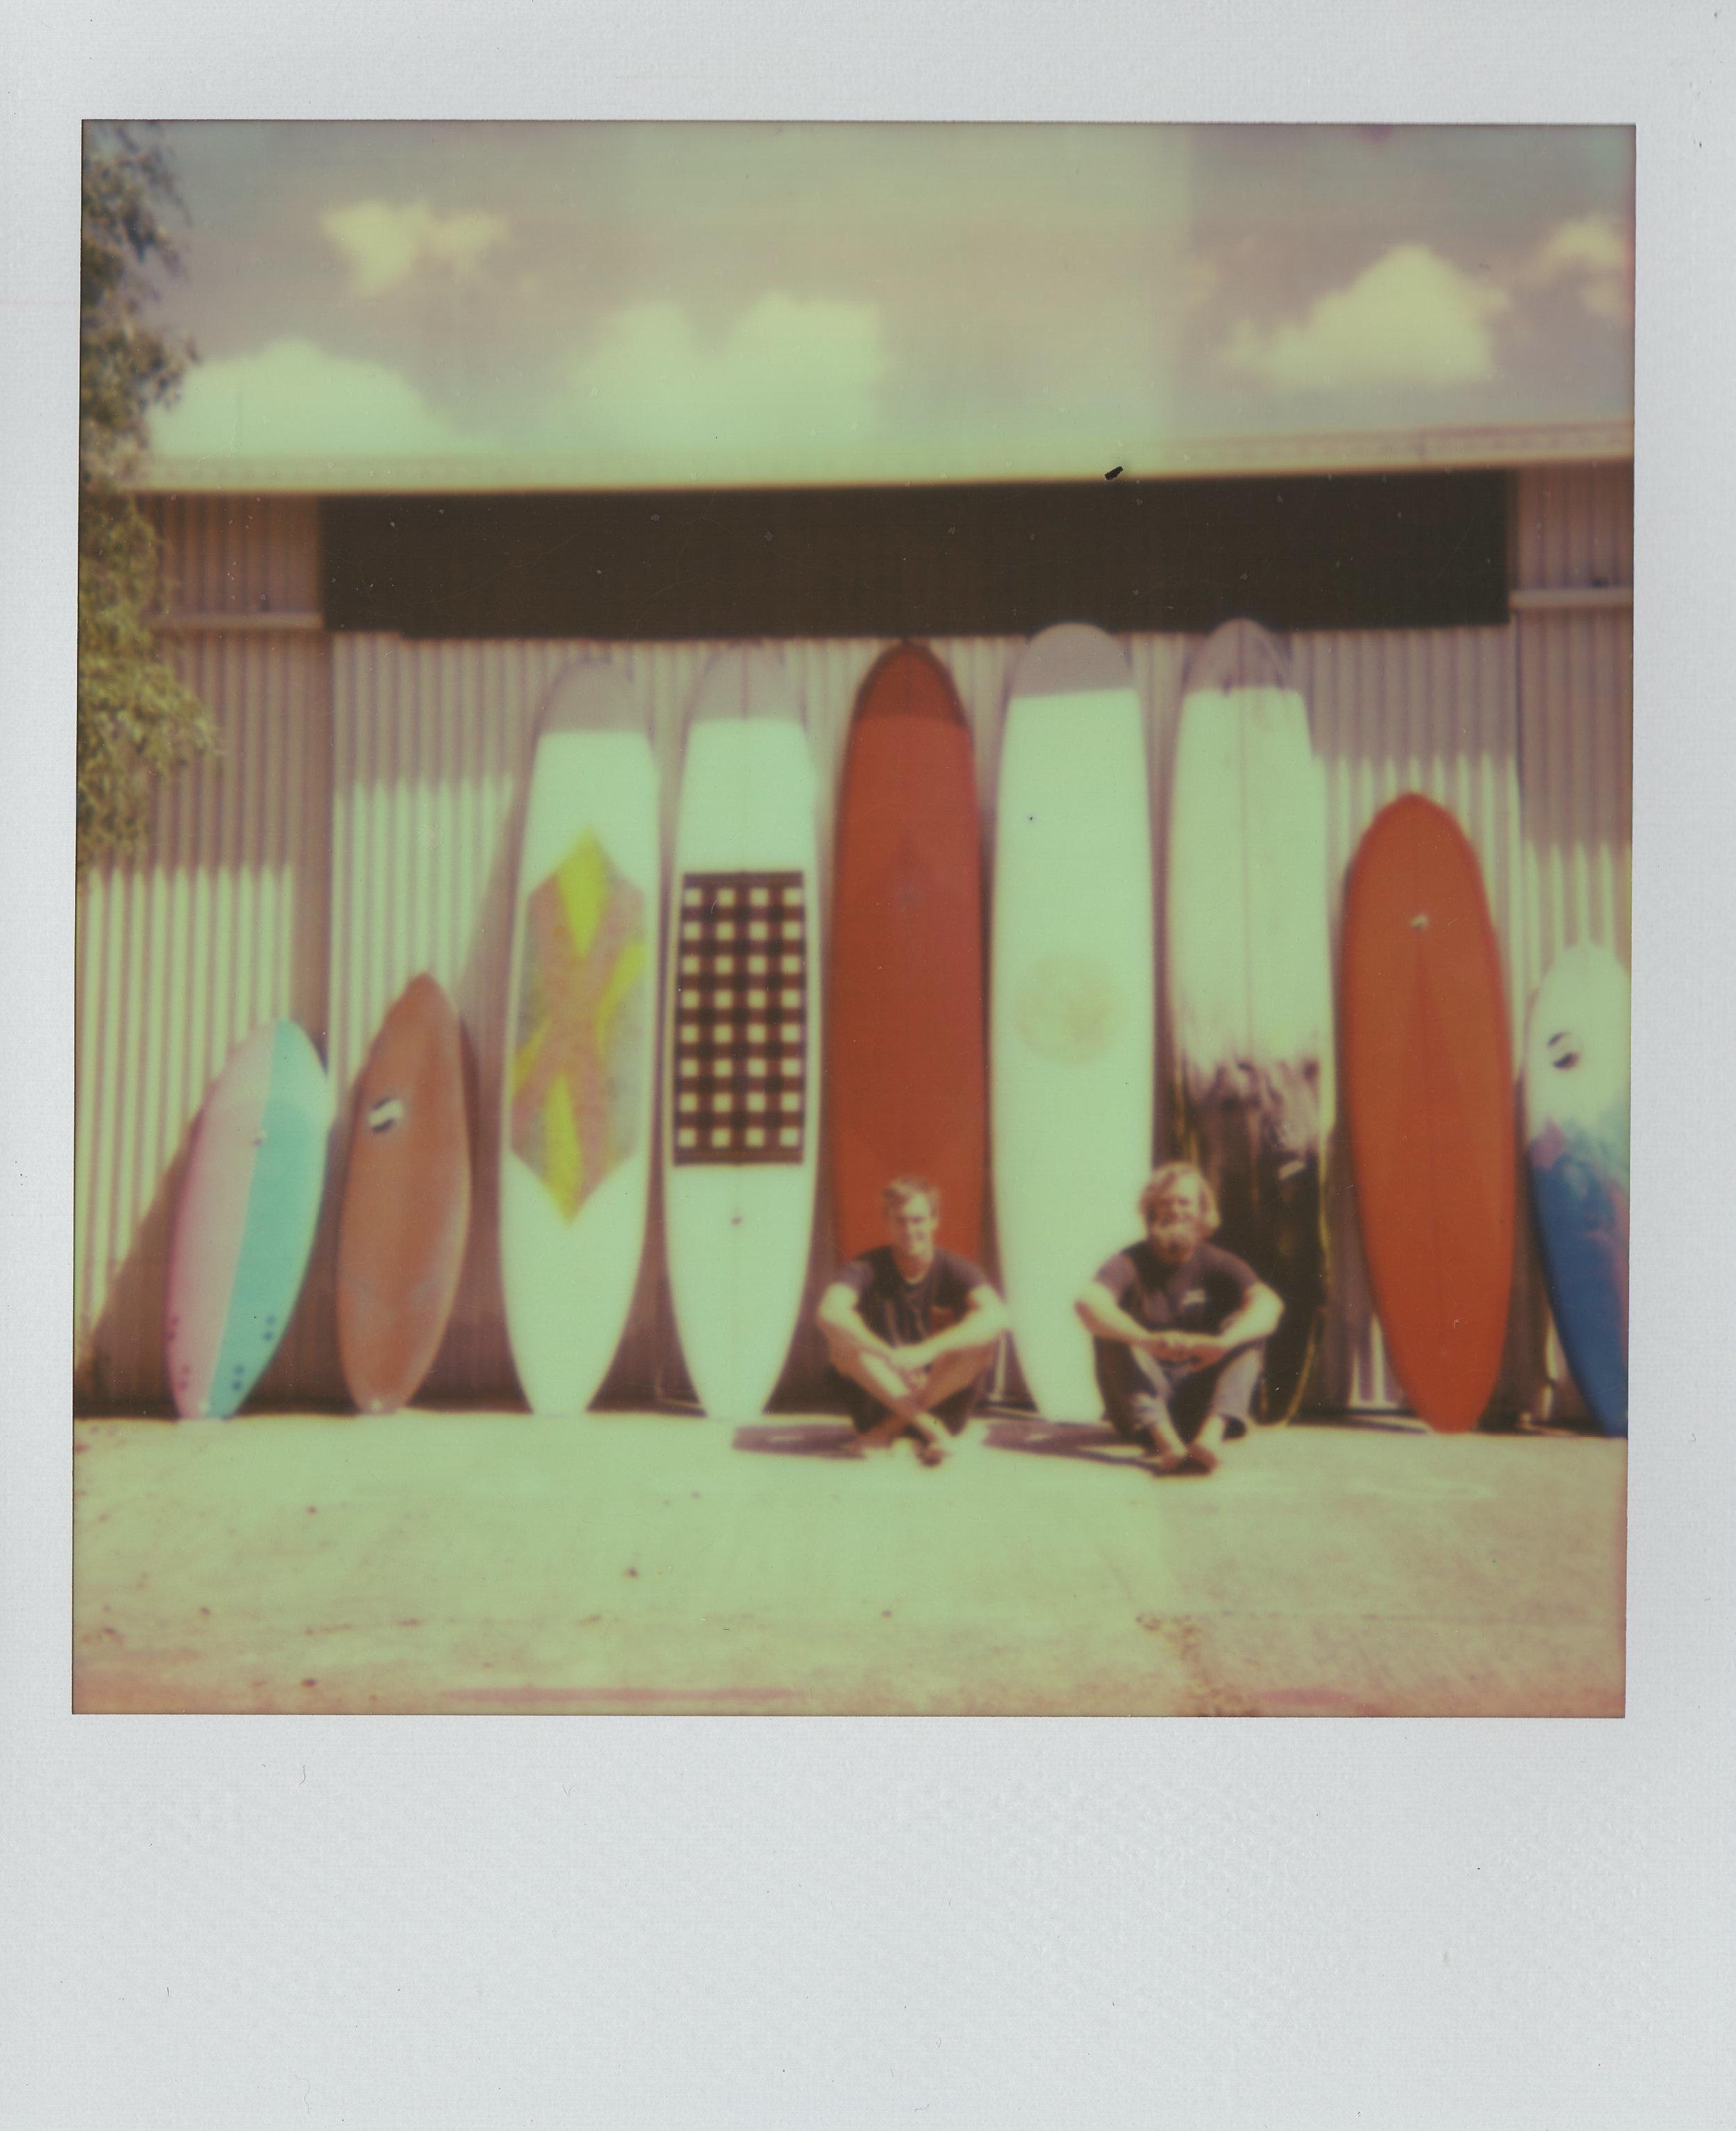 thomas surfboard2.jpg